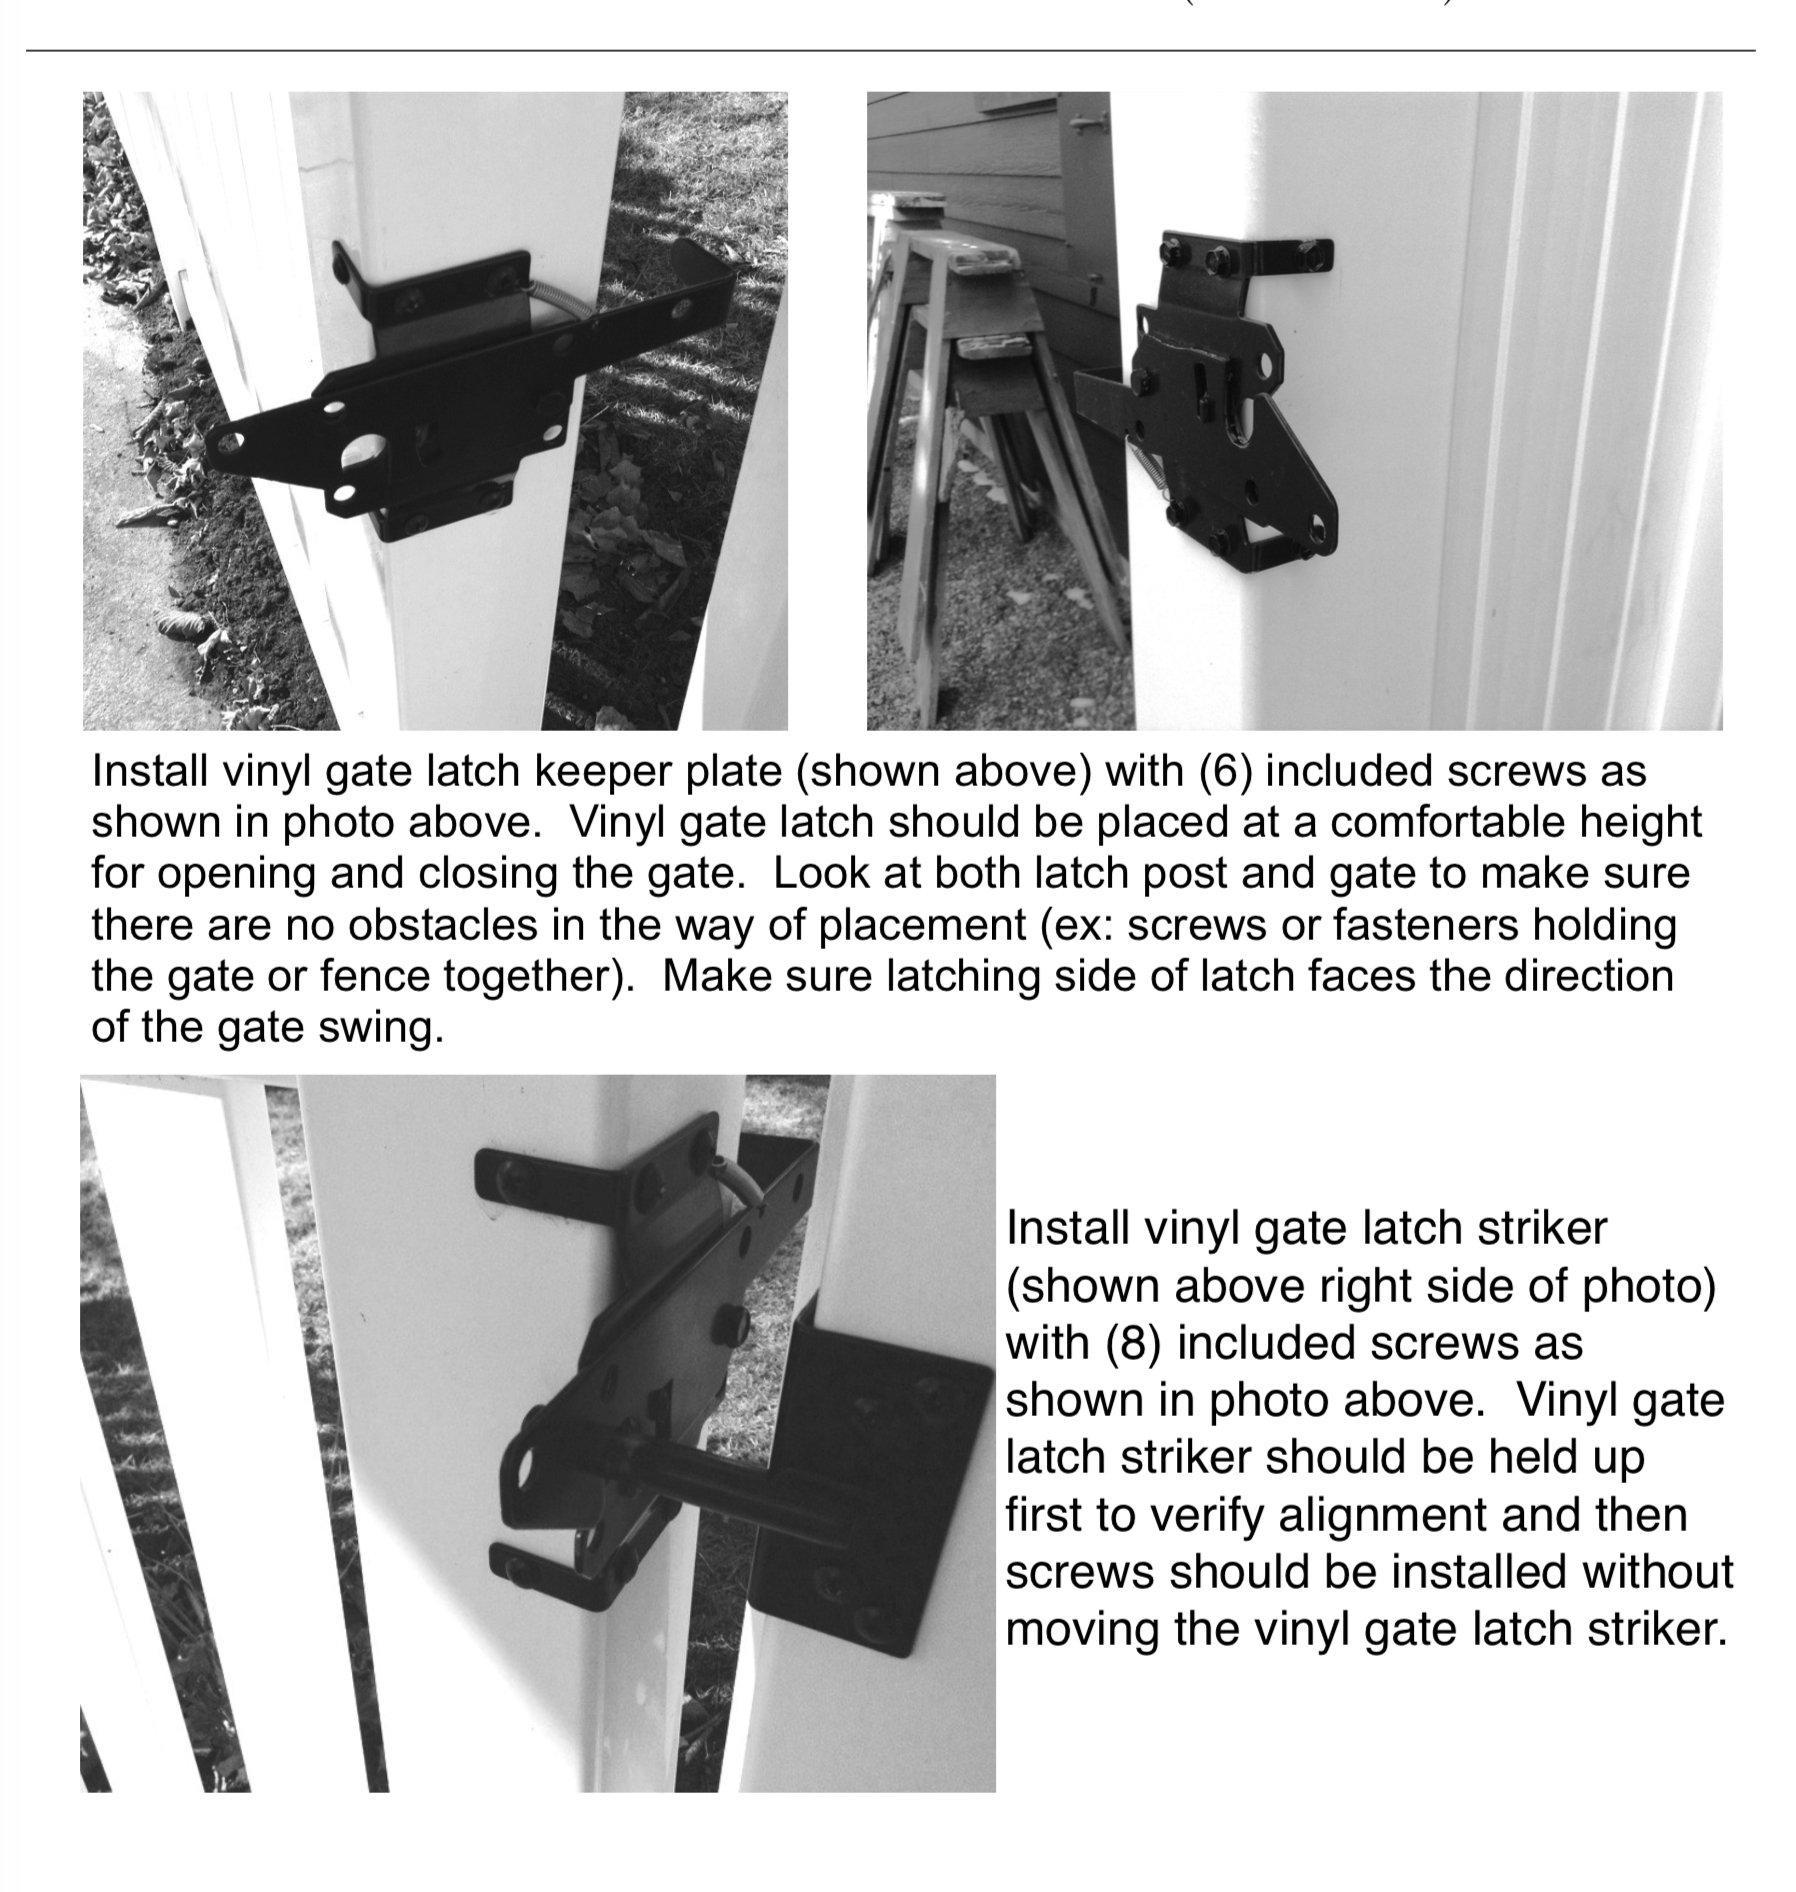 Self Closing Vinyl Fence Gate Single Gate Hardware Kit White (for Vinyl, PVC etc. Fencing) Fence Gate Kit - Single Fence Gate Kit has 2 Hinges and 1 Latch w/Screws (Lockable Both Sides)